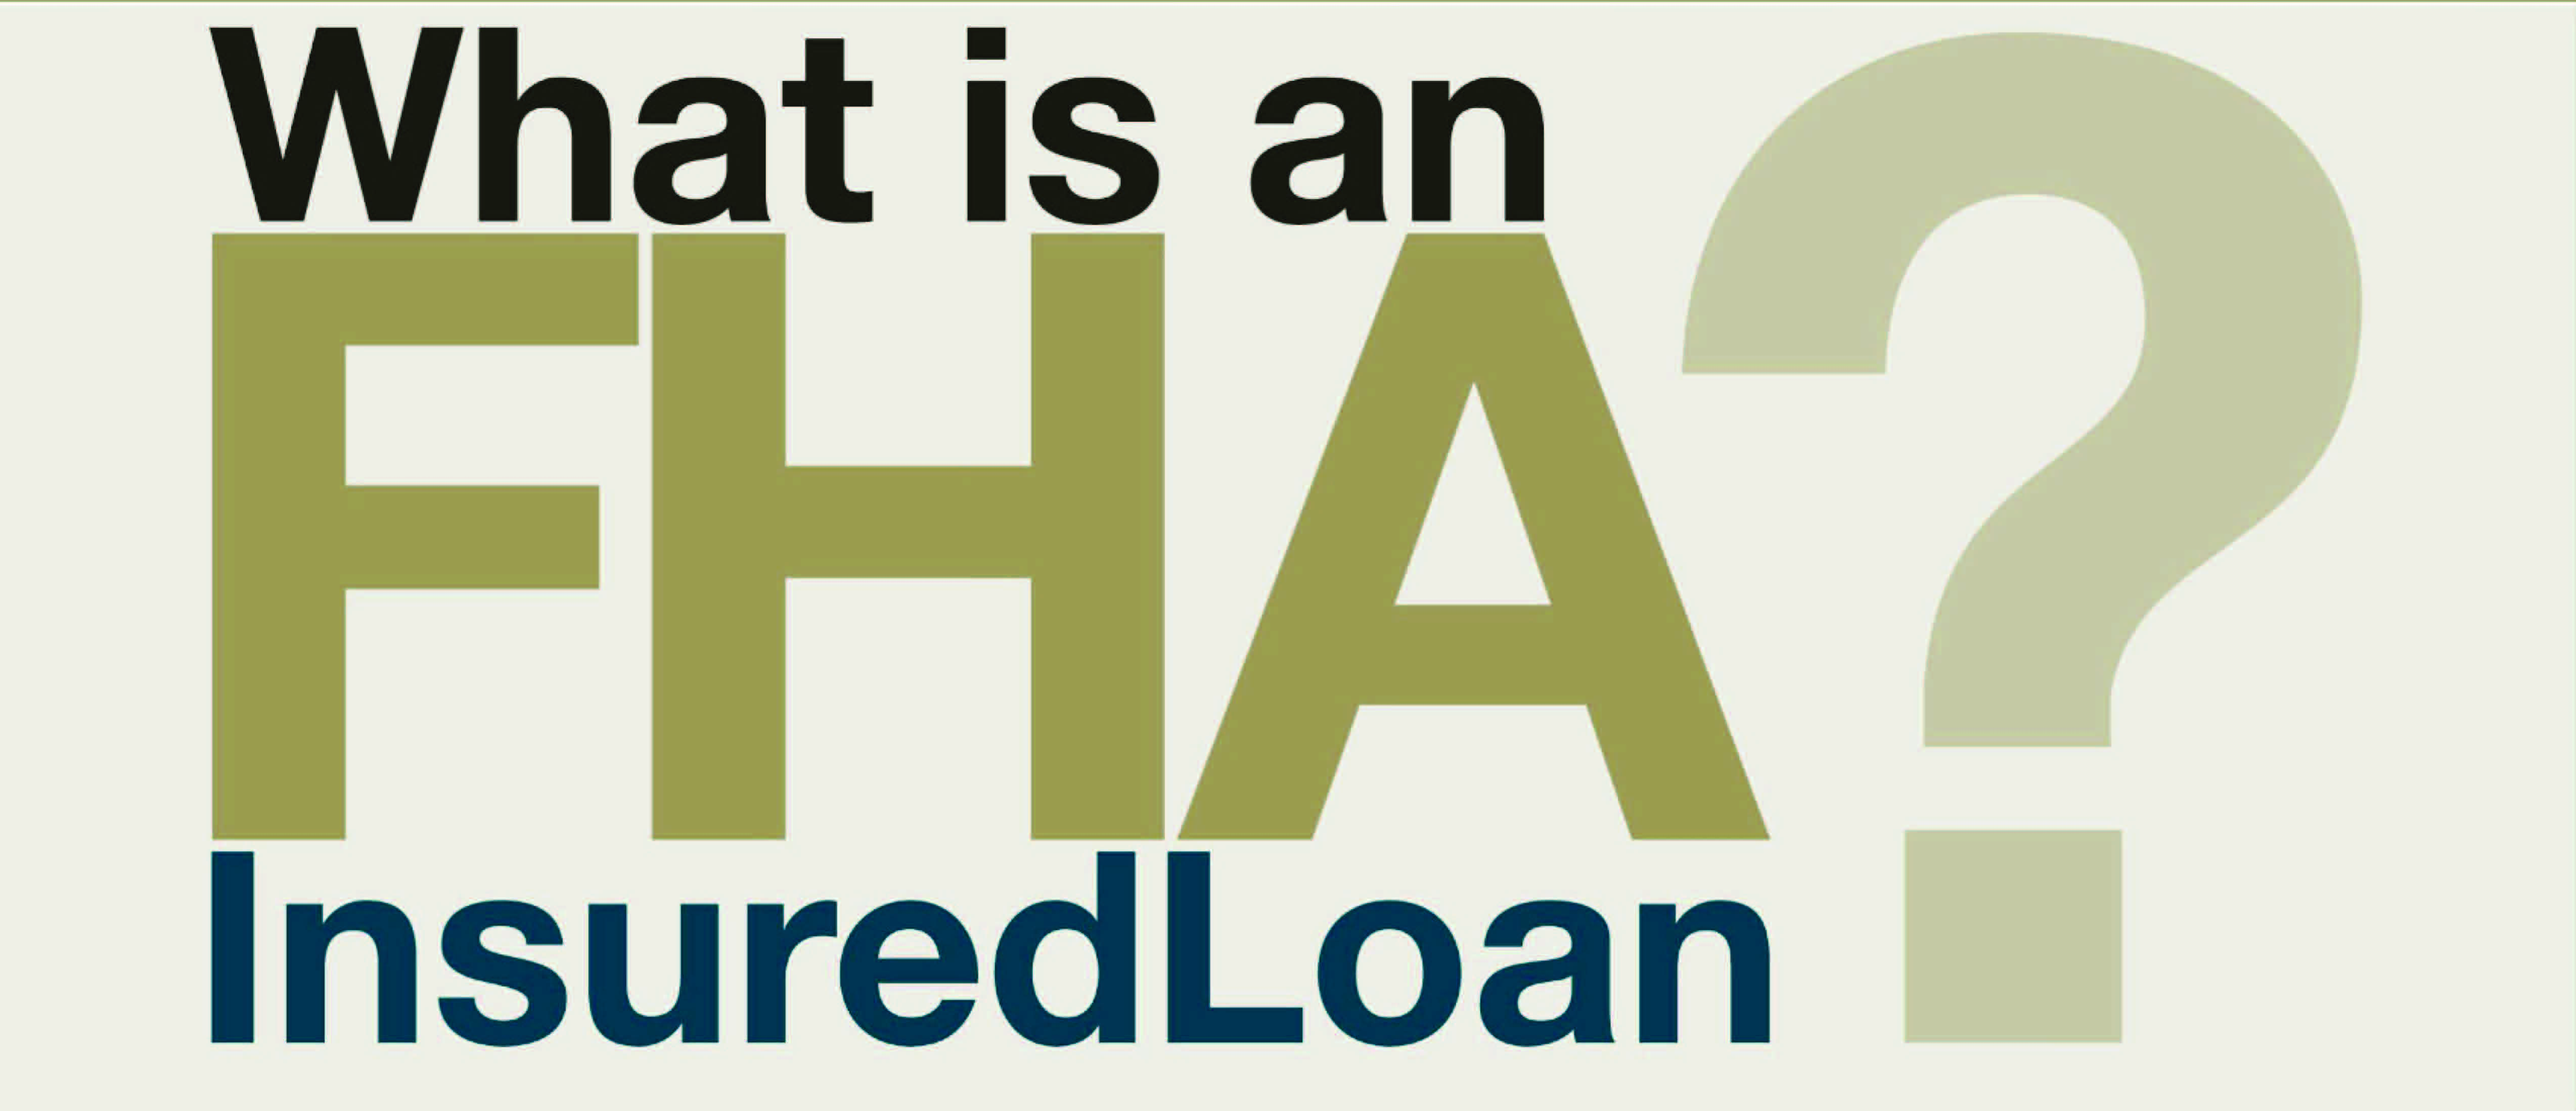 New orleans fha loan